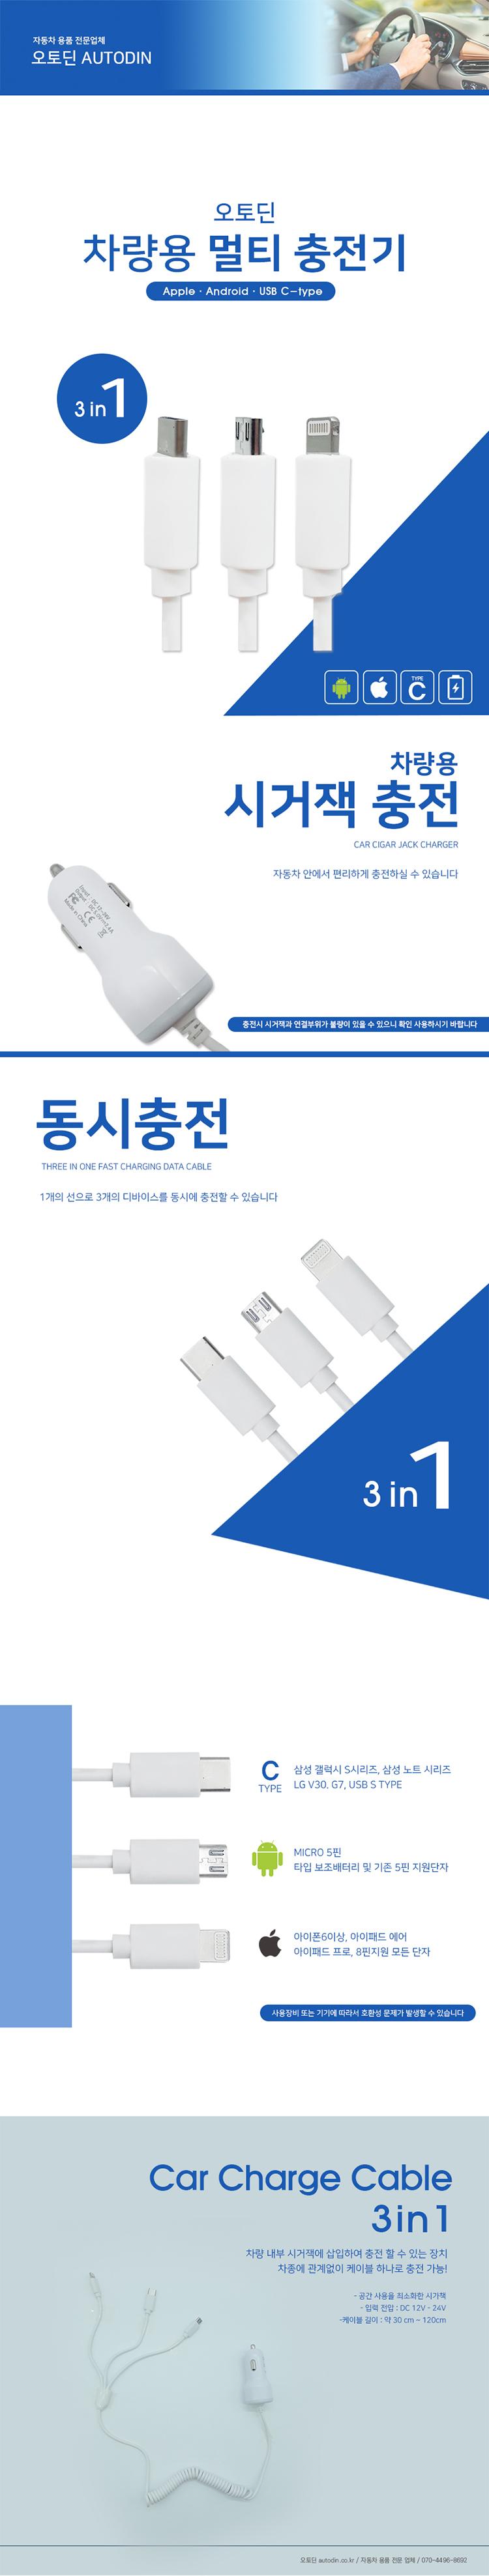 multi_%20car_charger.jpg